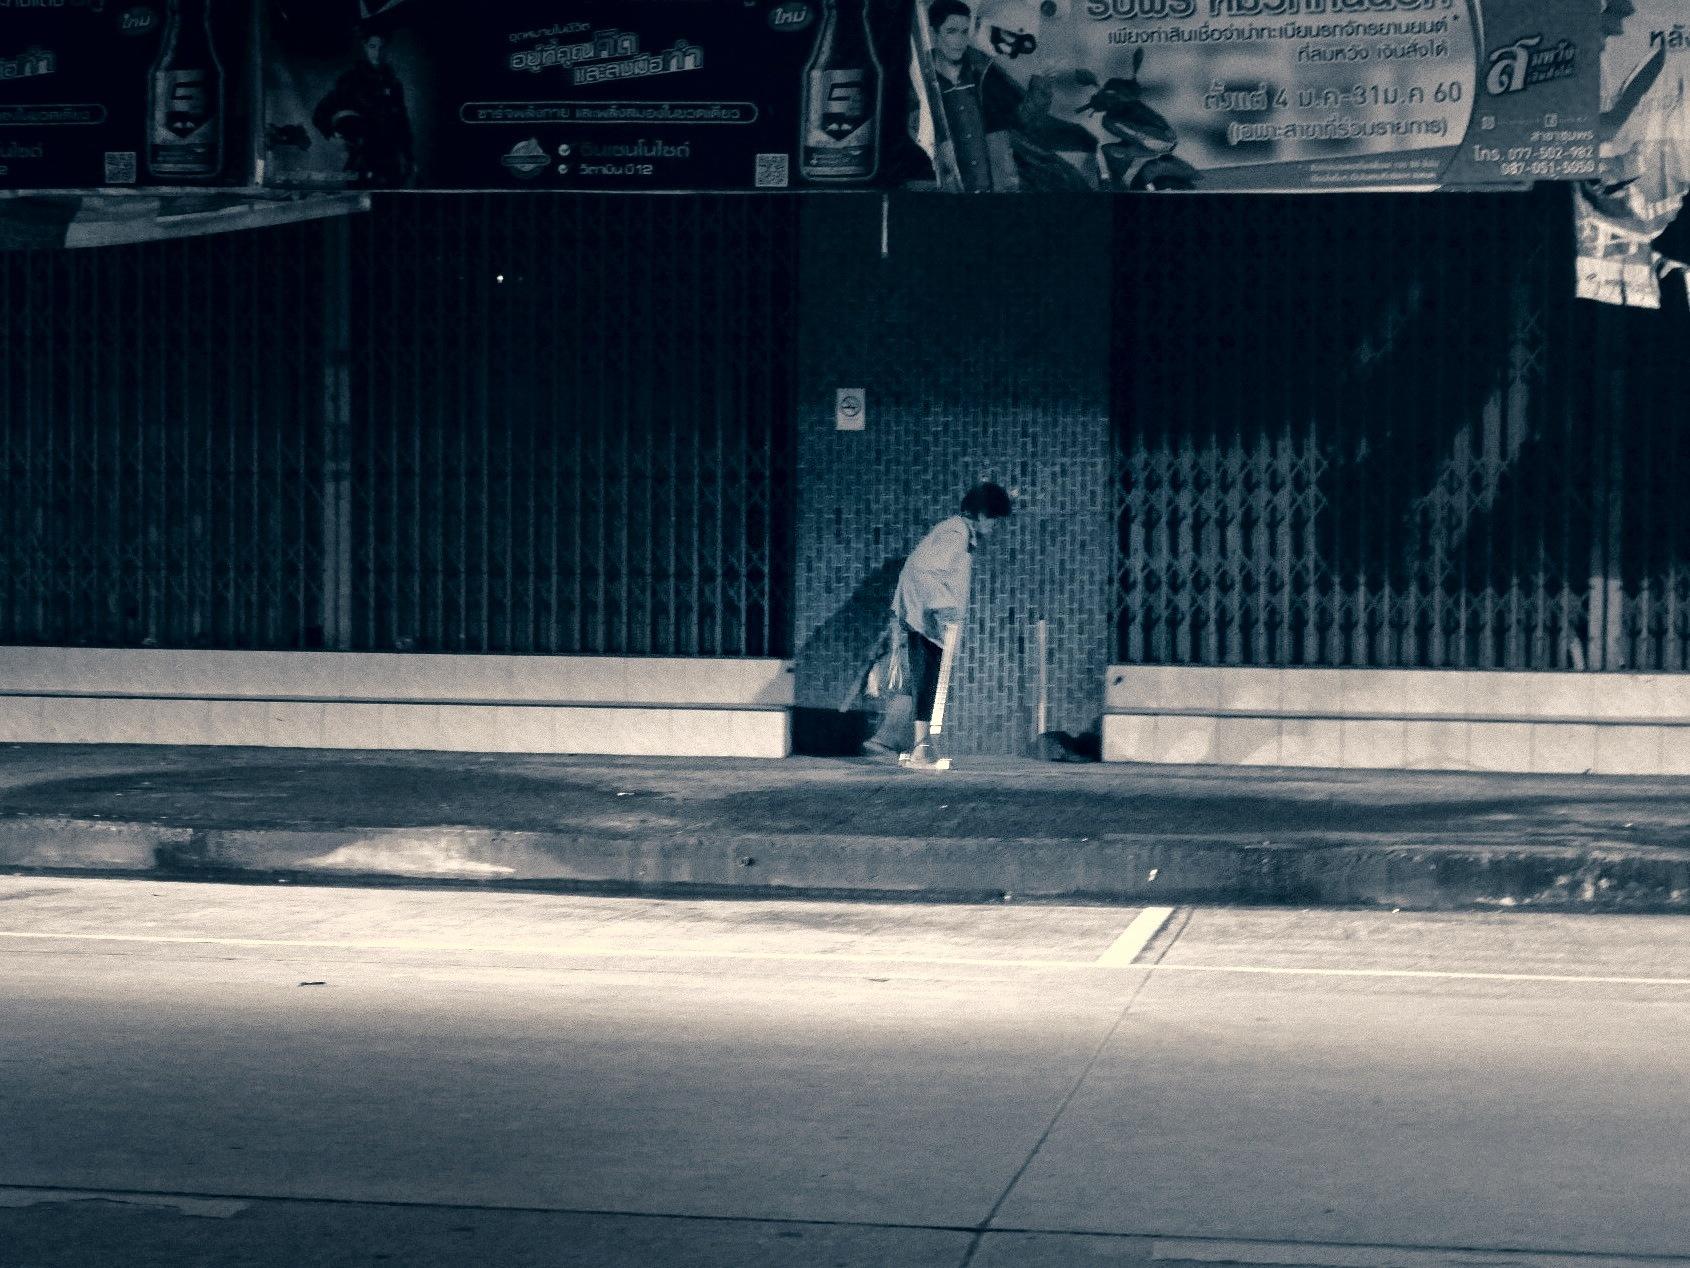 Solo shopper by TonyG